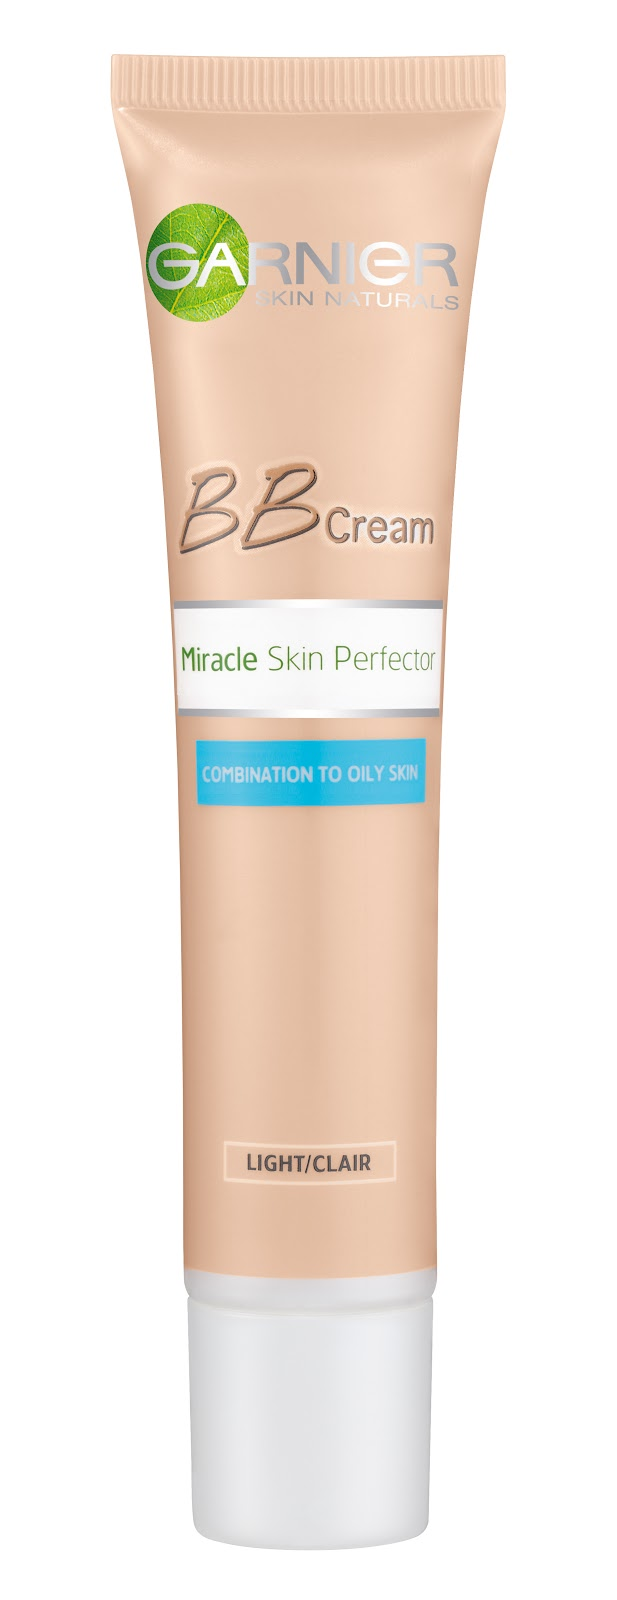 Hair and skin care tips: Garnier BB Cream Miracle Skin Perfector ...